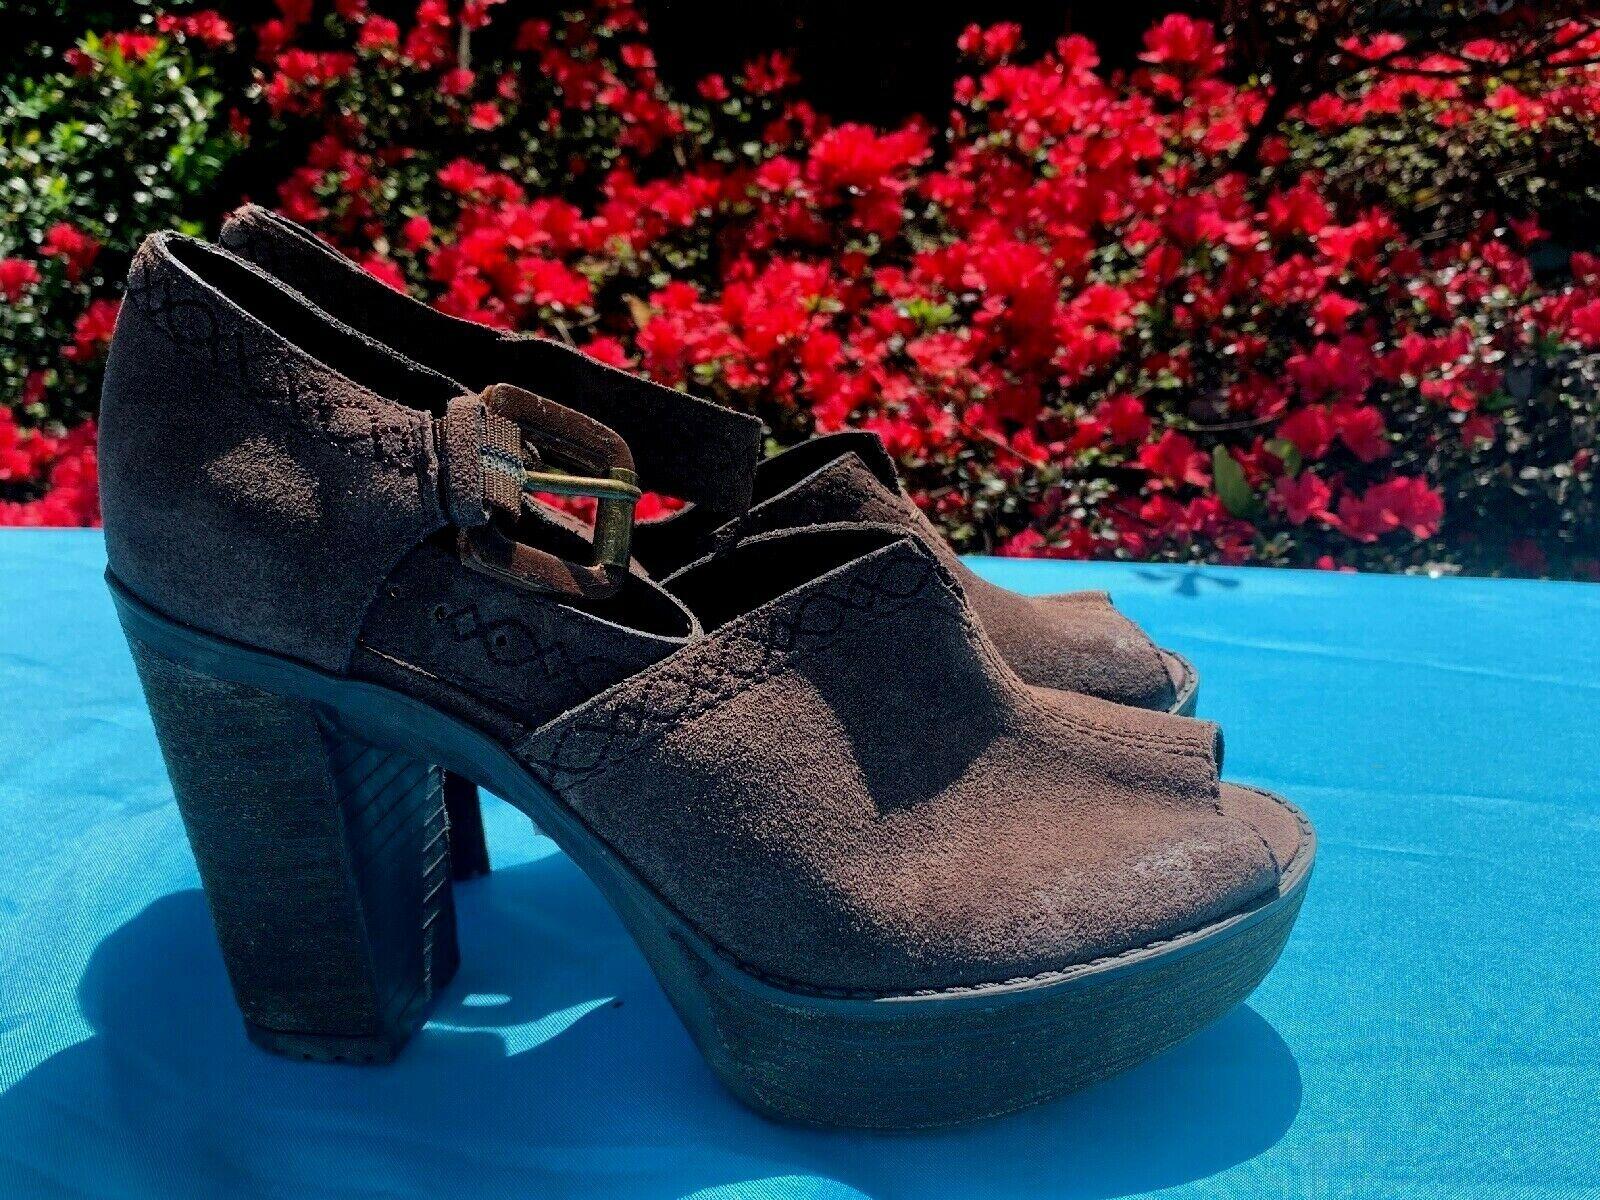 NICOLE Brand New High Heel Peep Toe Espadrilles Platforms Wedges Sz 6 ❤️ ts17j